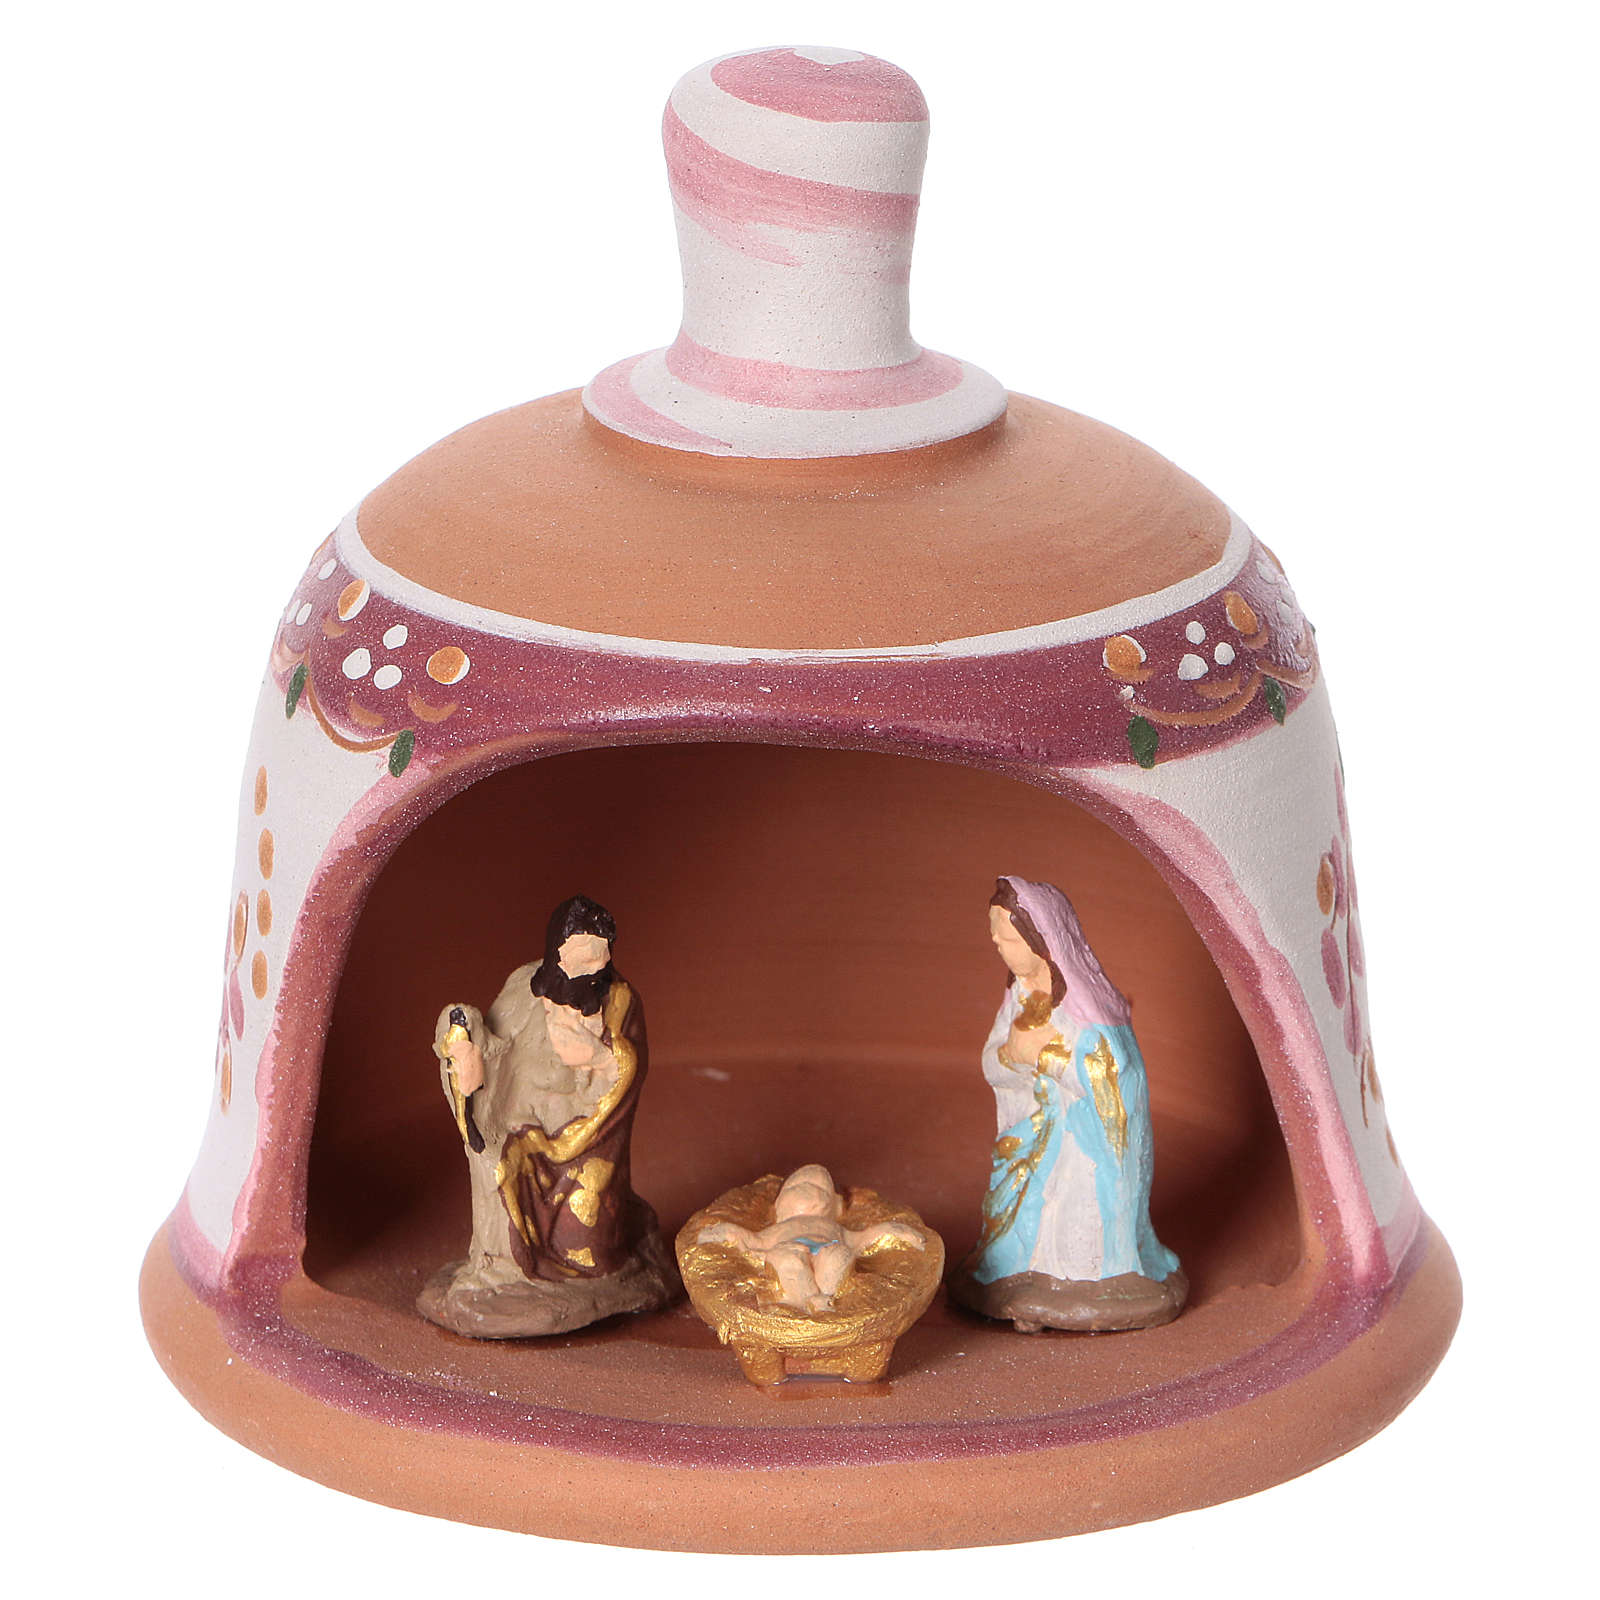 Pink terracotta hut with Nativity scene 3 cm made in Deruta 4